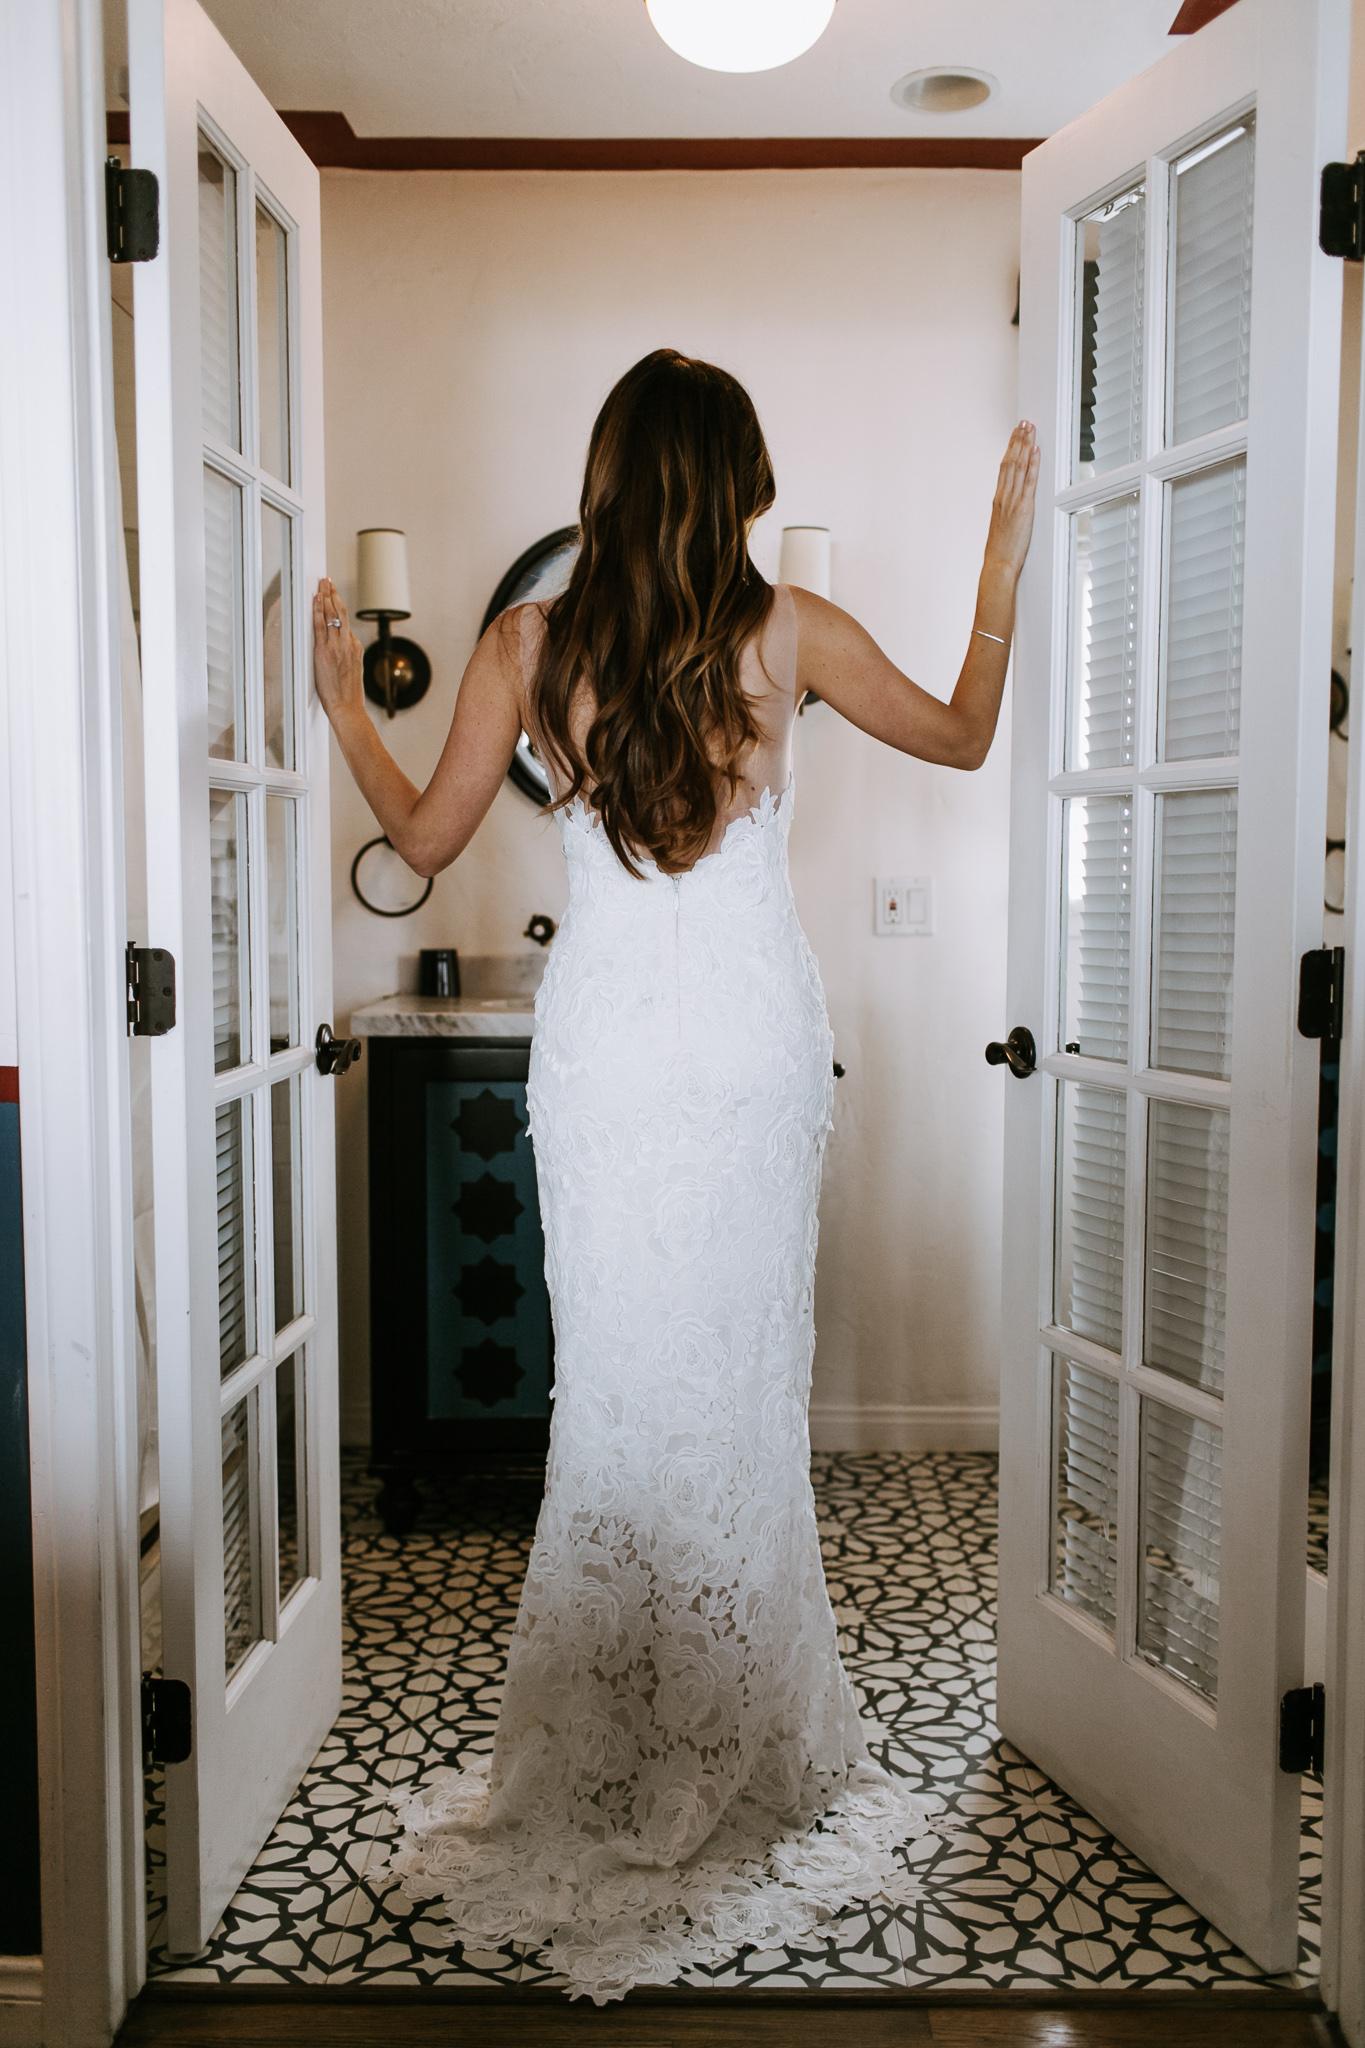 LagunaBeach-WeddingPhotographer-11.jpg